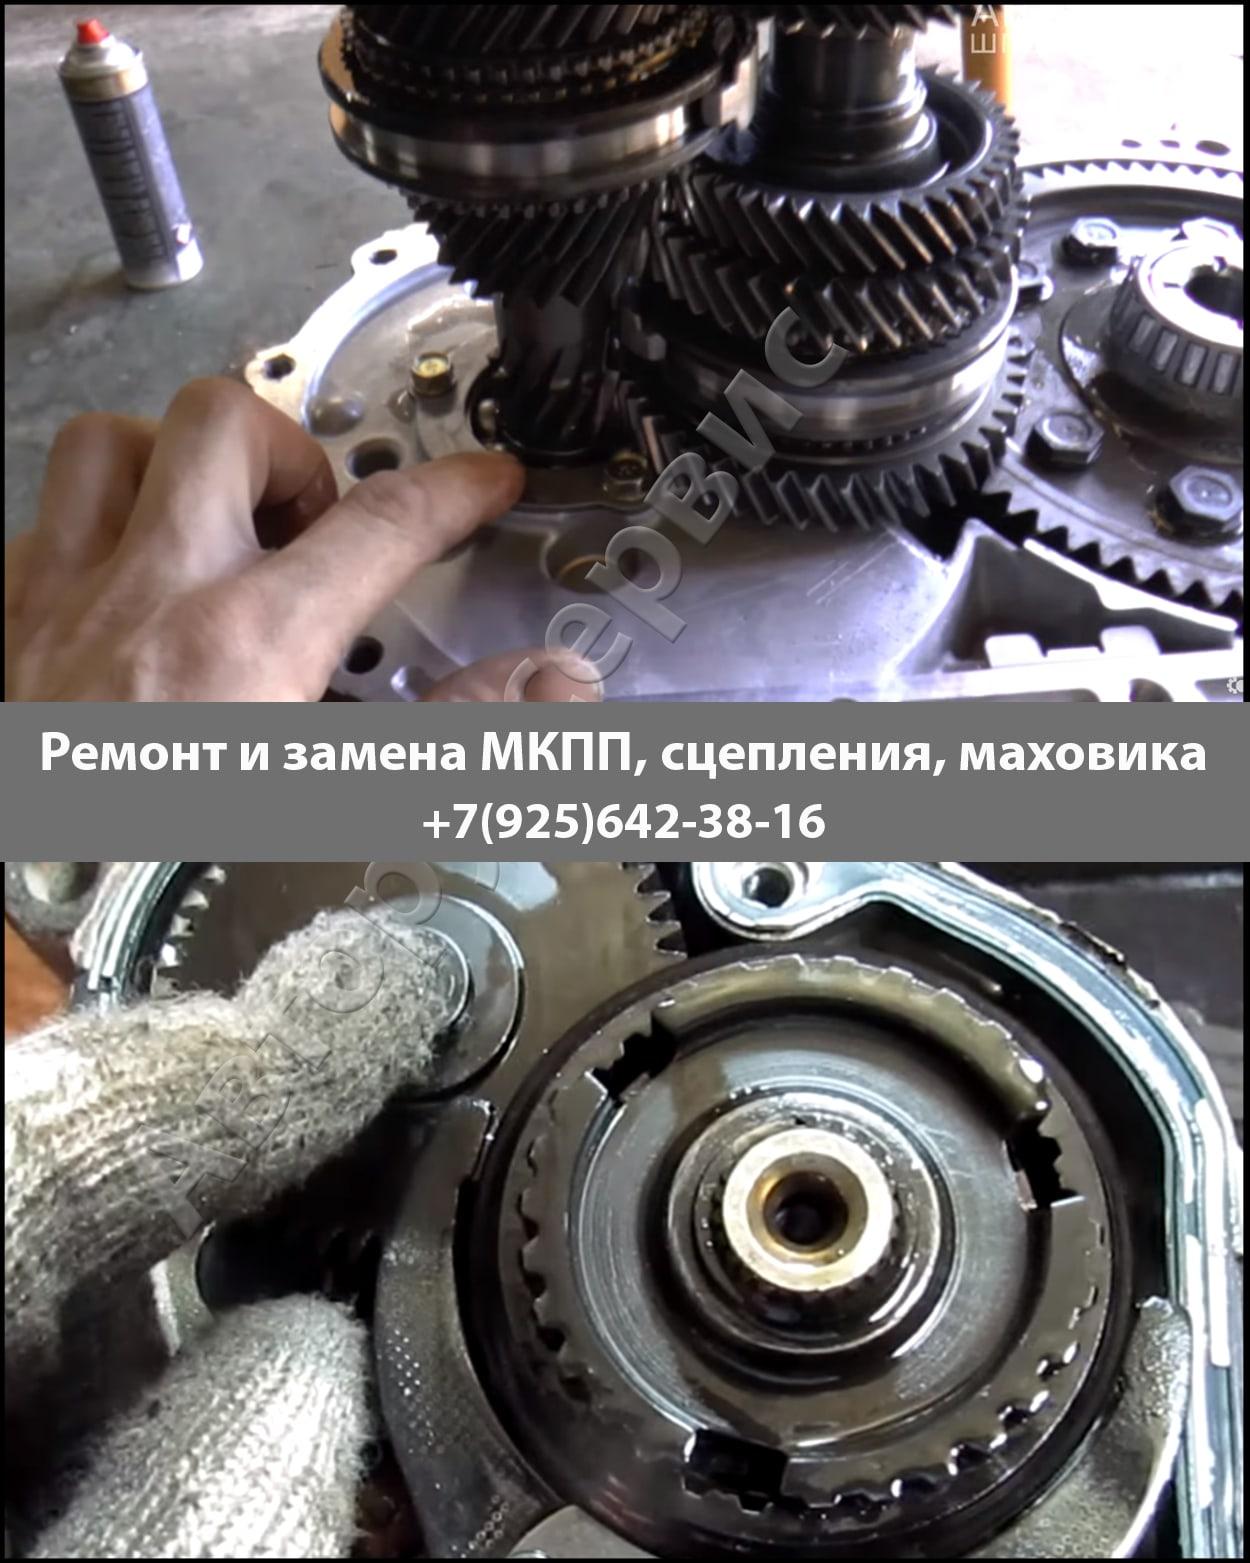 Ремонт МКПП Isuzu D-Max